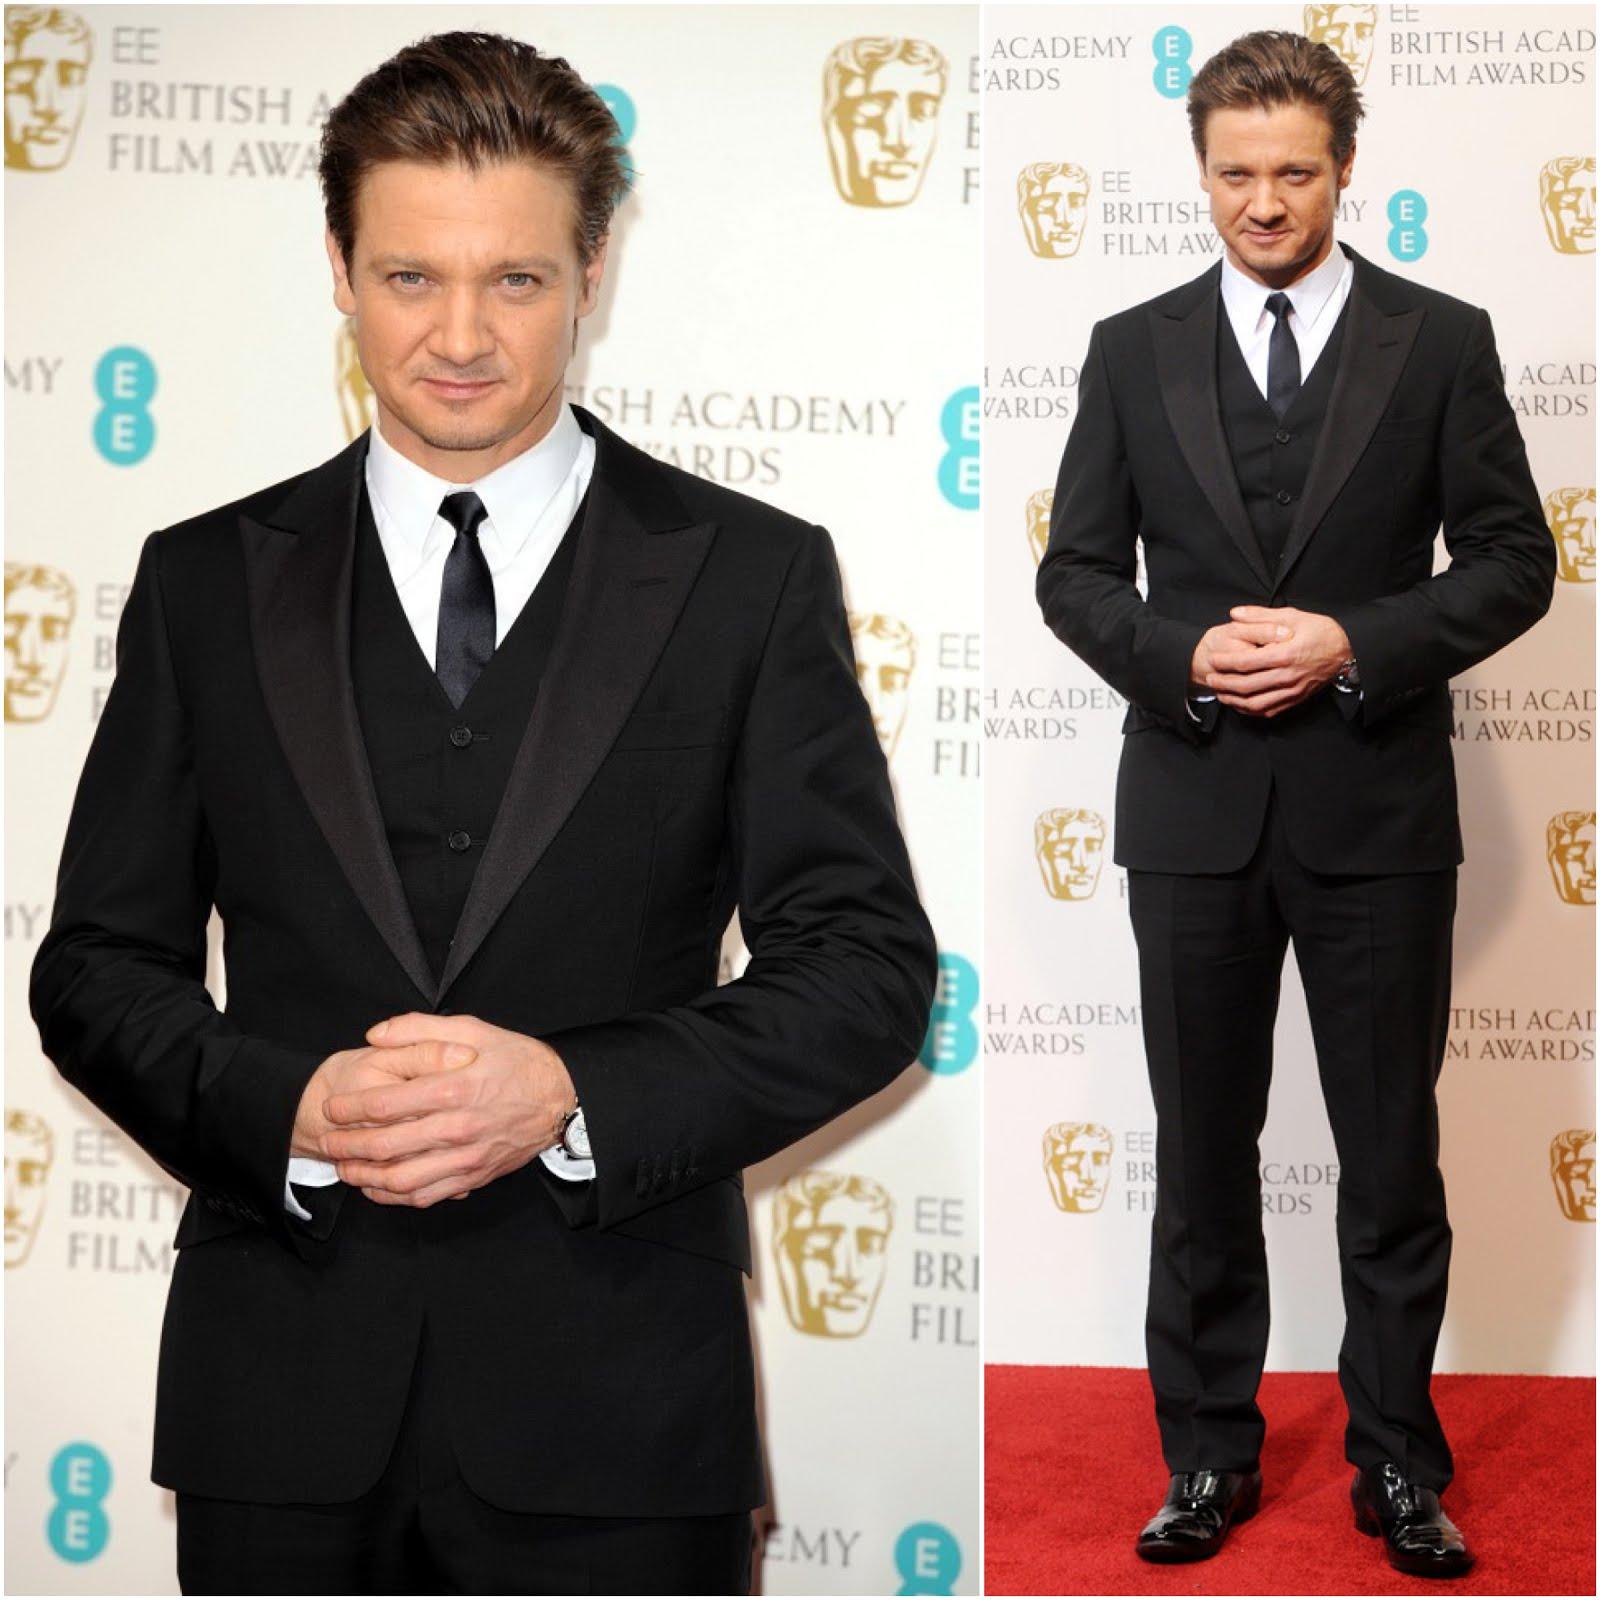 00O00 Menswear Blog Jeremy Renner in Alfred Dunhill - 66th BAFTA Awards, London